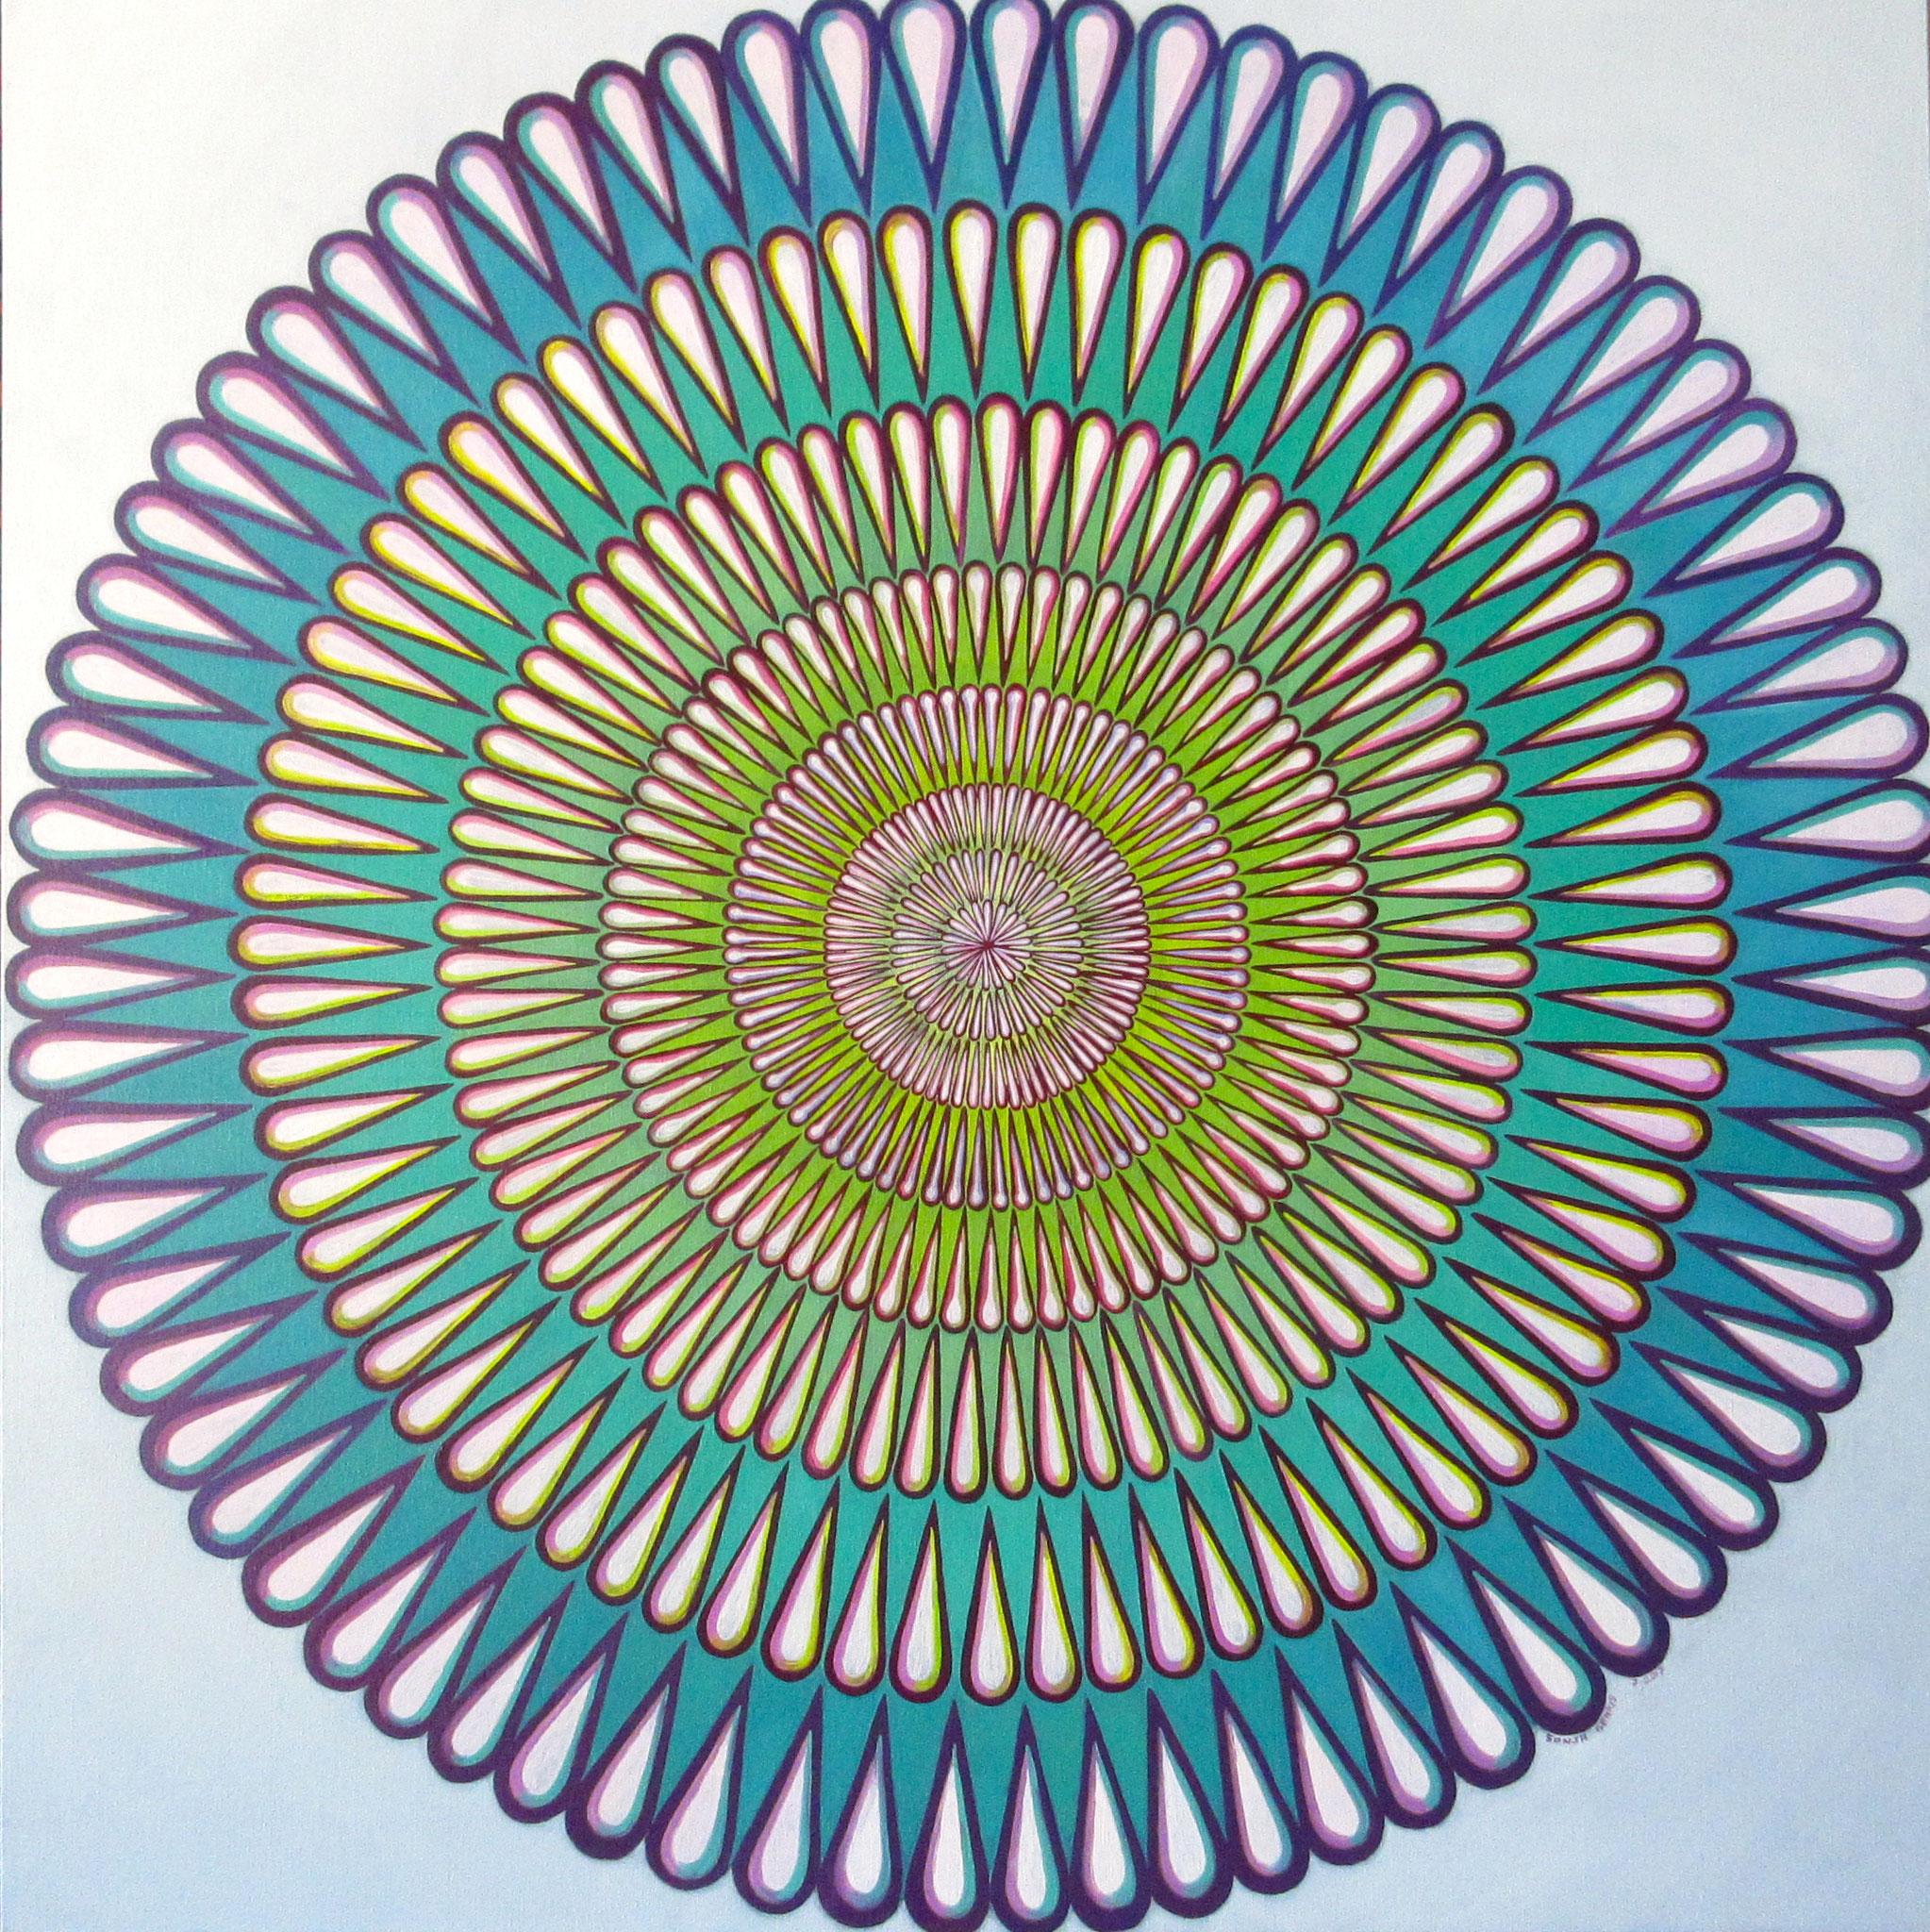 """Slinky"" oil on canvas 36x36, June 2017 (7-8)"